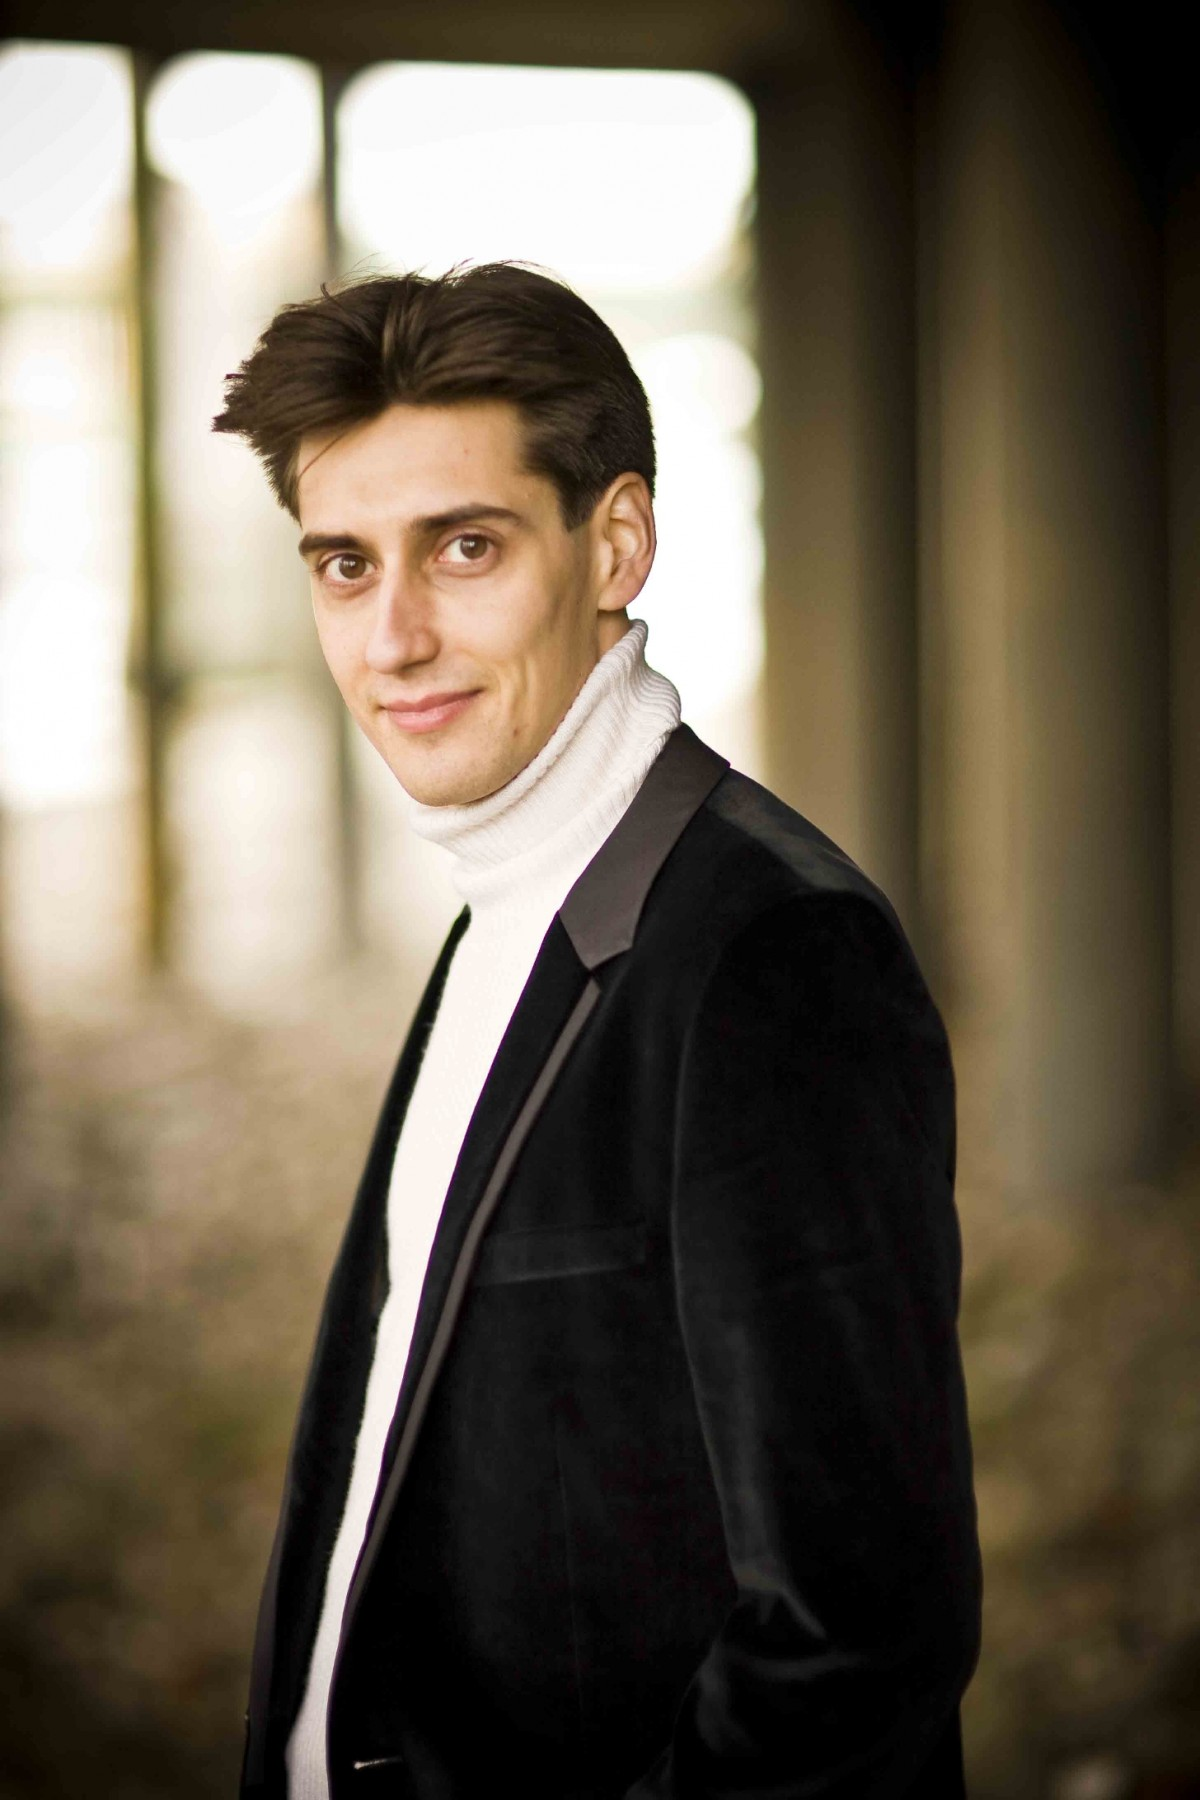 Yevgeny Sudbin, pianist